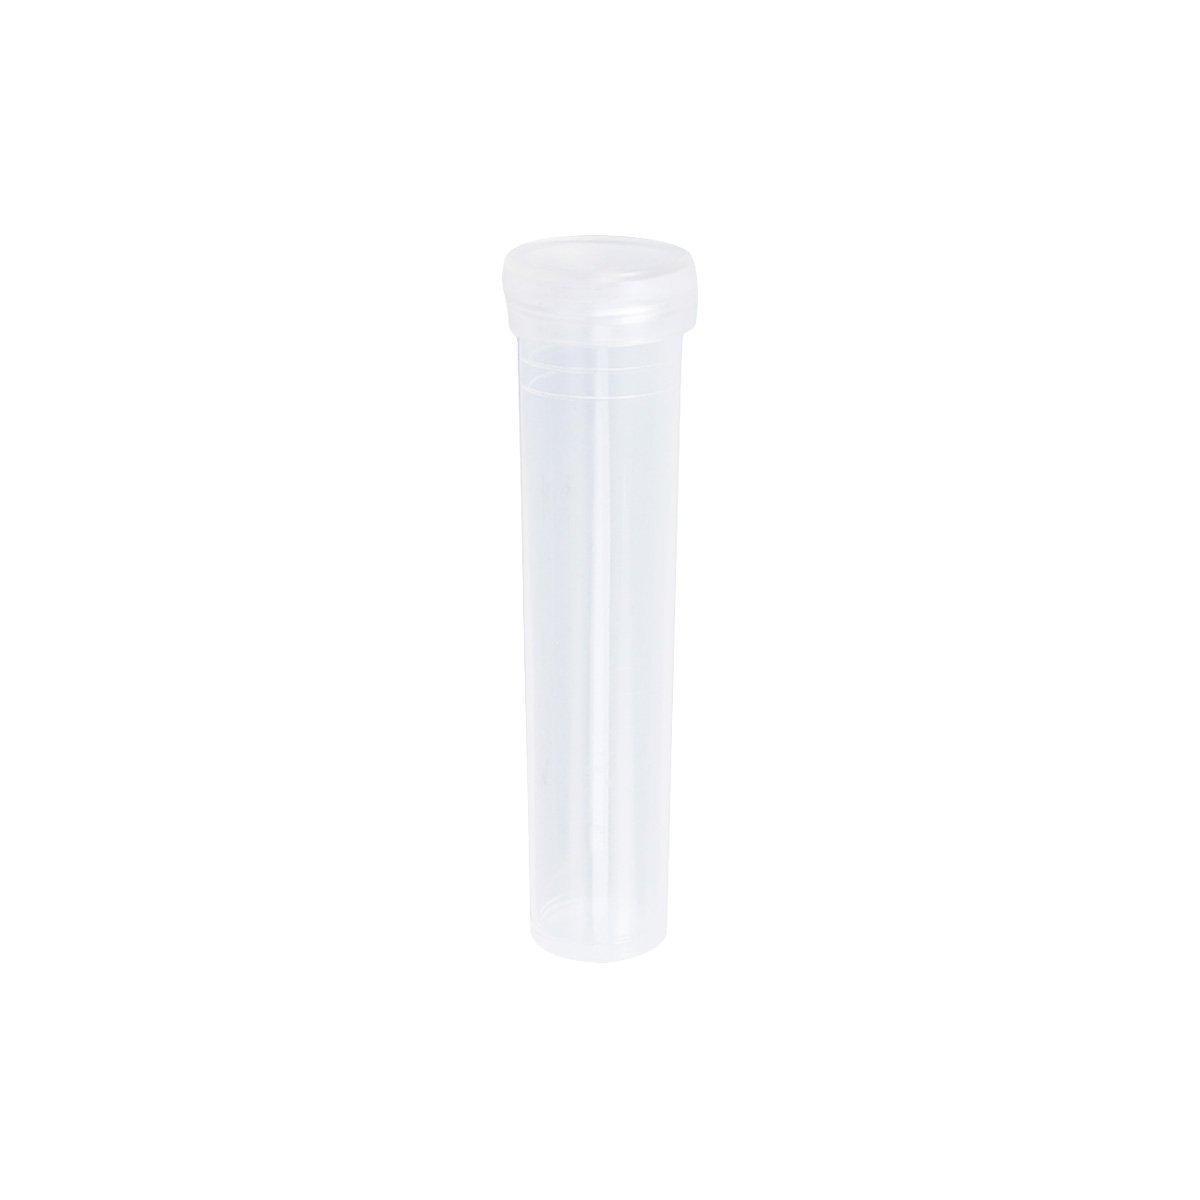 100 St/ück Healifty Aquarium Tubi Reagenzgl/äser aus transparentem Kunststoff Blumenkappen